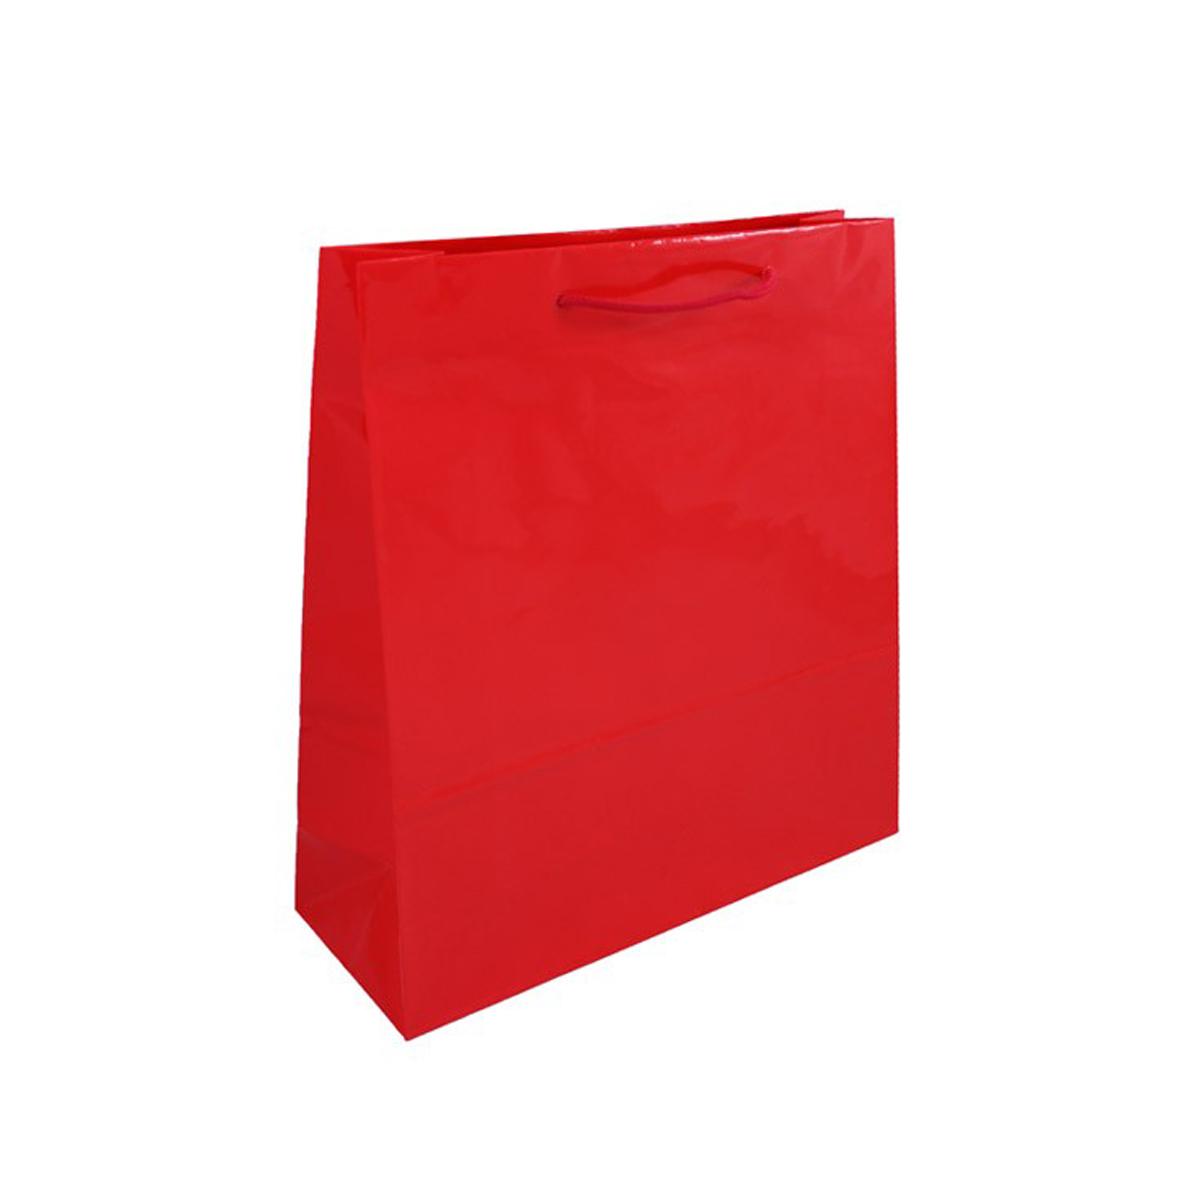 Geschenktüten Große Geschenktasche - Rot 36 x 12 x 40 cm 93524